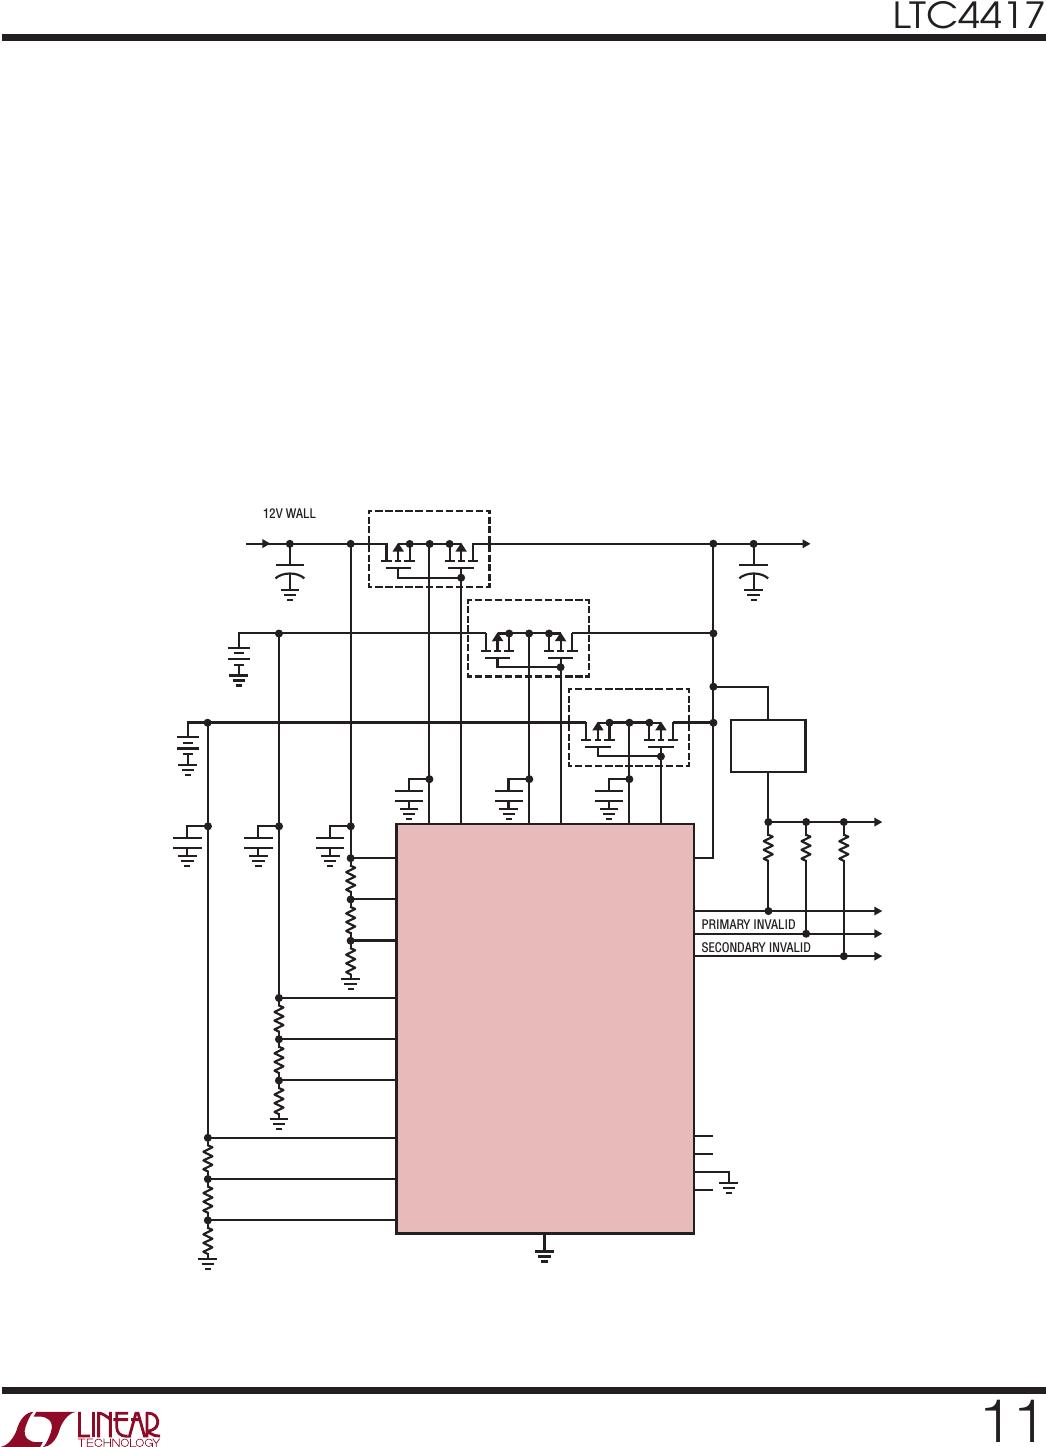 hight resolution of ltc4417 datasheet linear tech adi digikey figure 4 circuit diagram of battery supply 12v alkaline and 84v